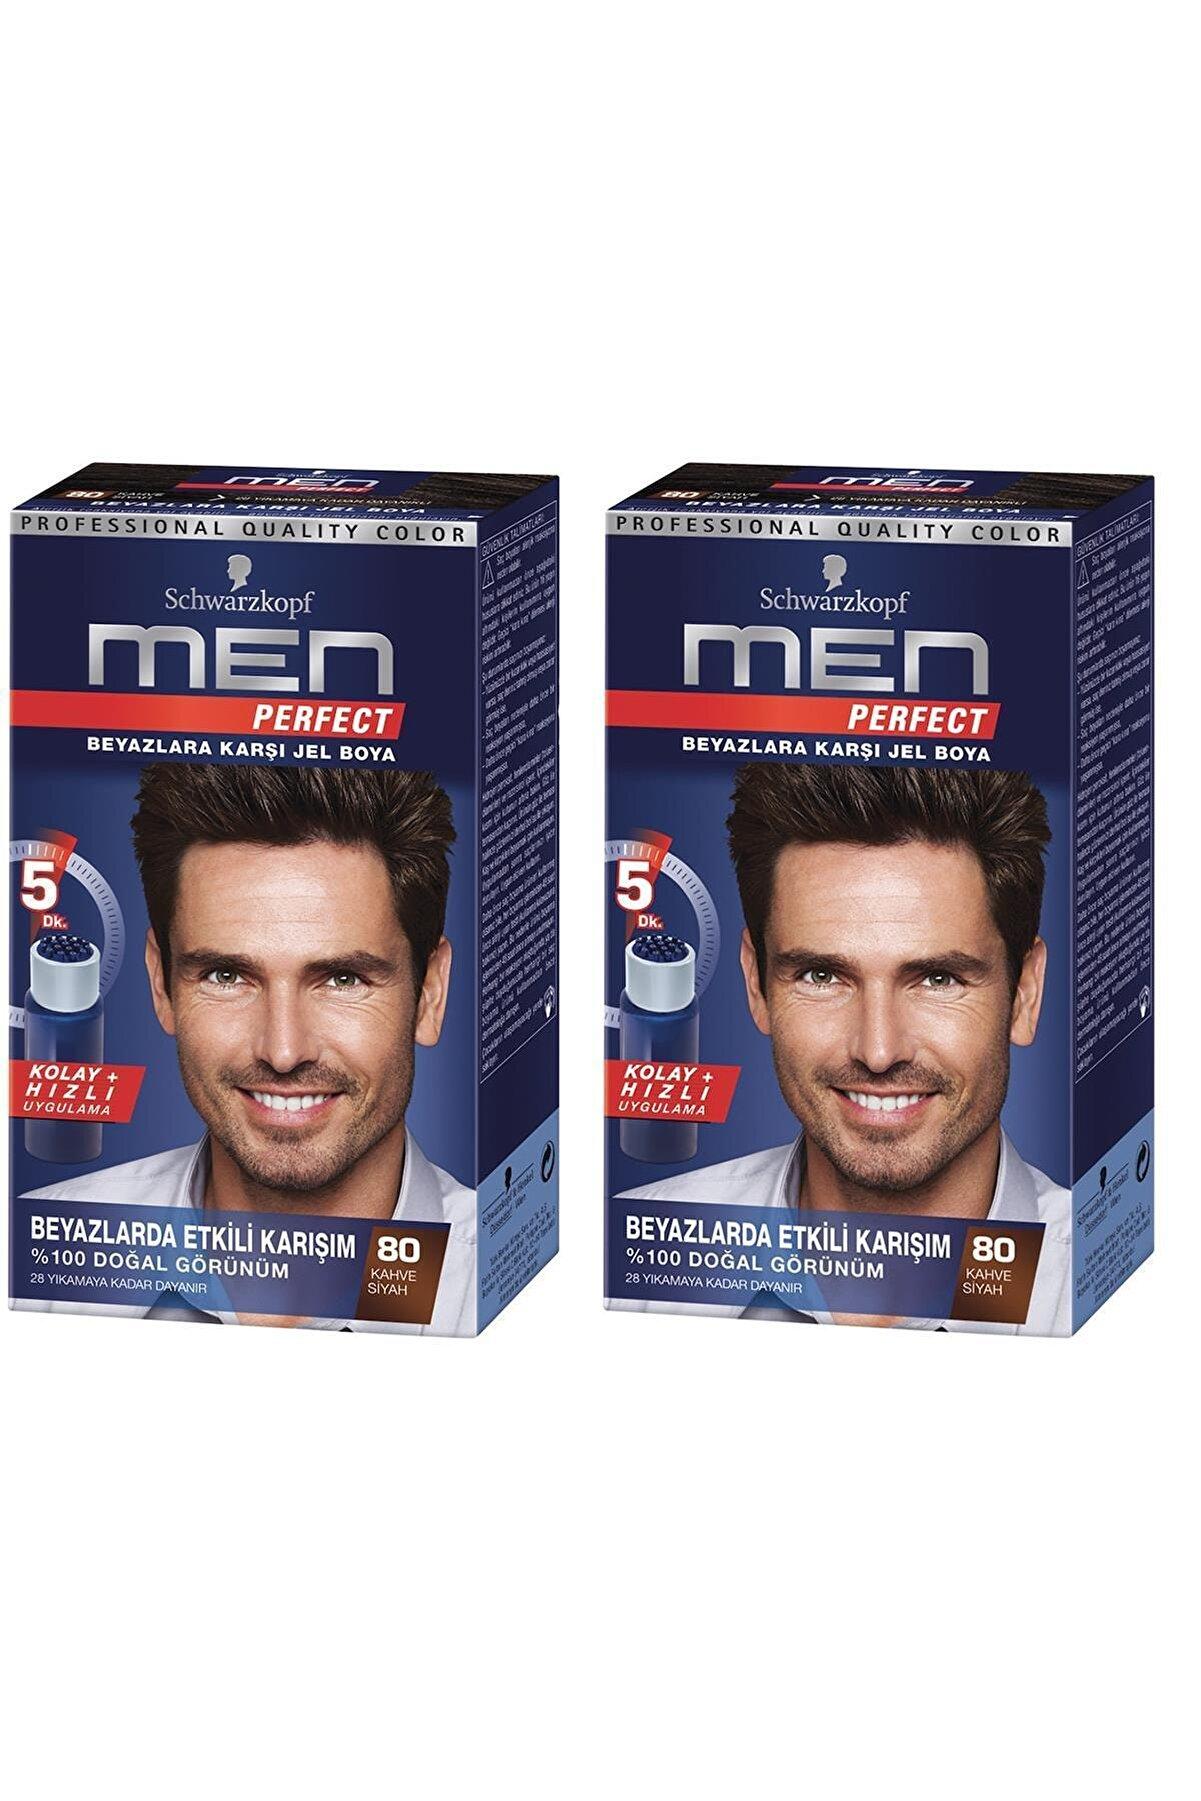 Schwarzkopf Perfect Men 80 Siyah Kahve Saç Boyası x 2 adet